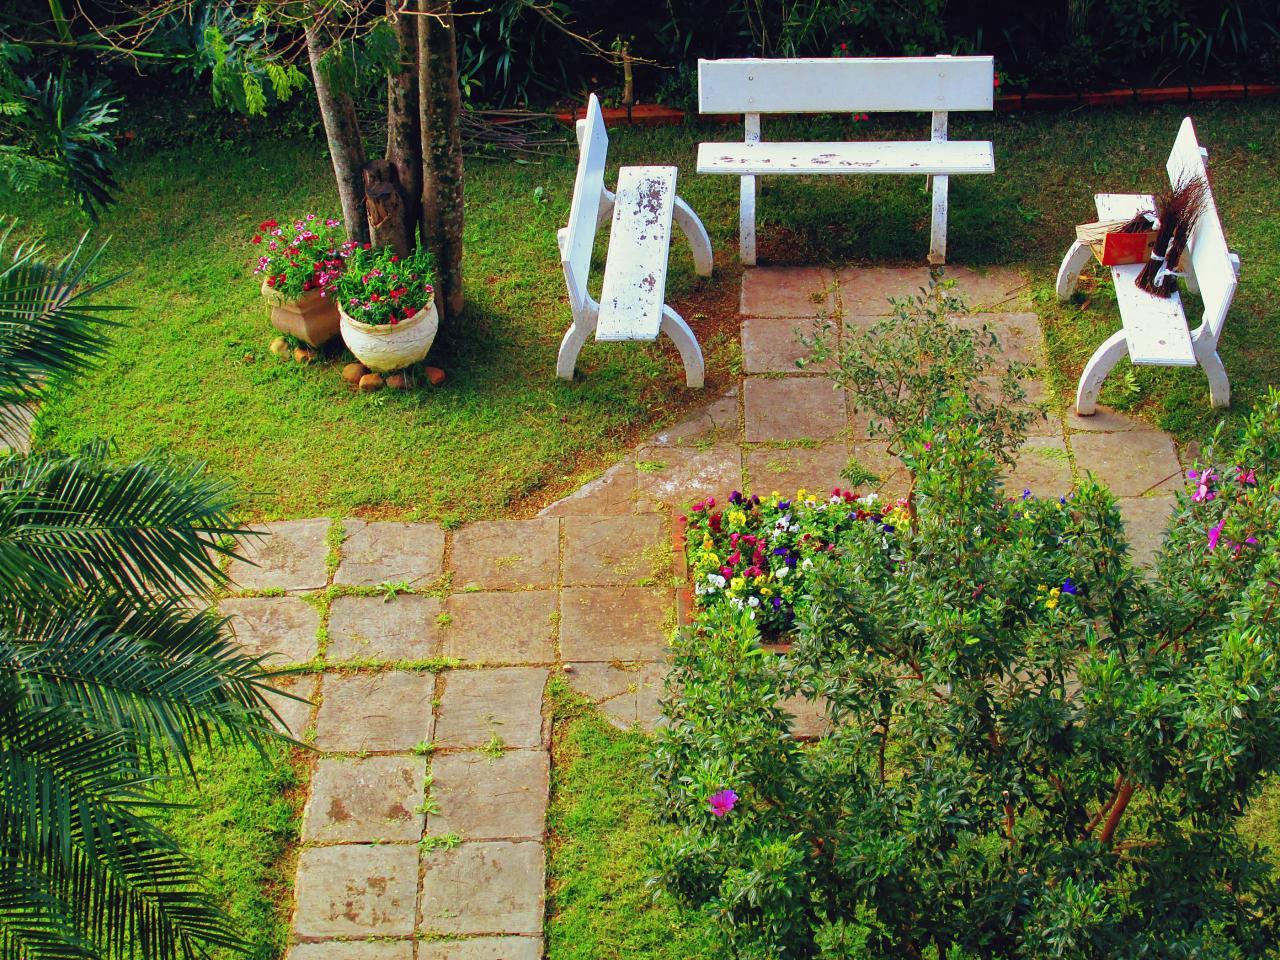 Dise os atractivos para jardines peque os lifestyle de for Diseno de jardin